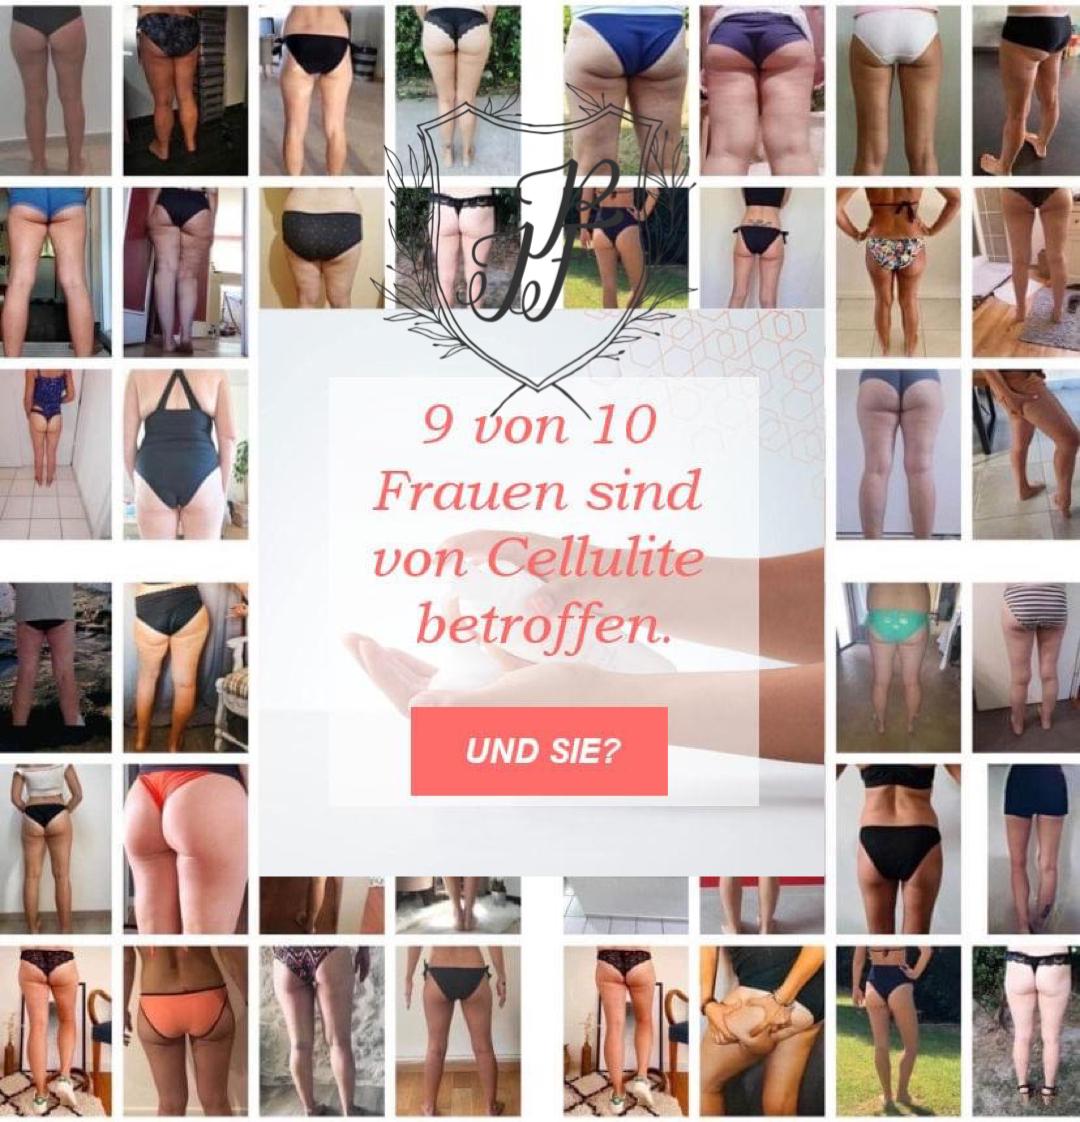 Cellulite und Orangenhaut